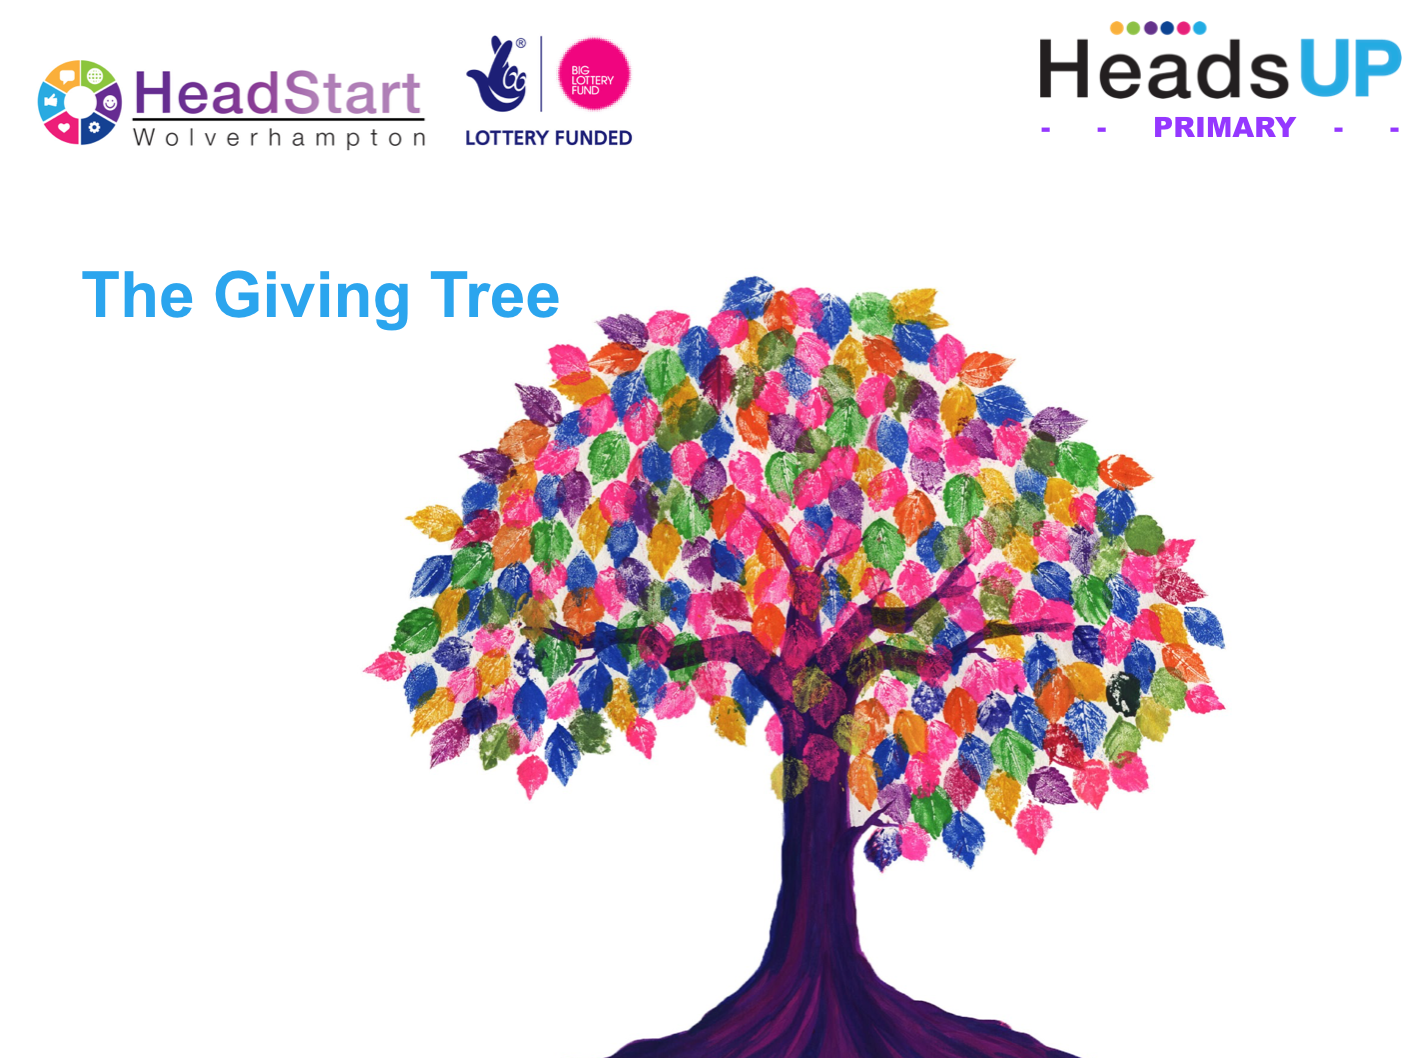 HeadStart_HeadsUP_Primary_Presentation_KP_-_15-10-15 2.png